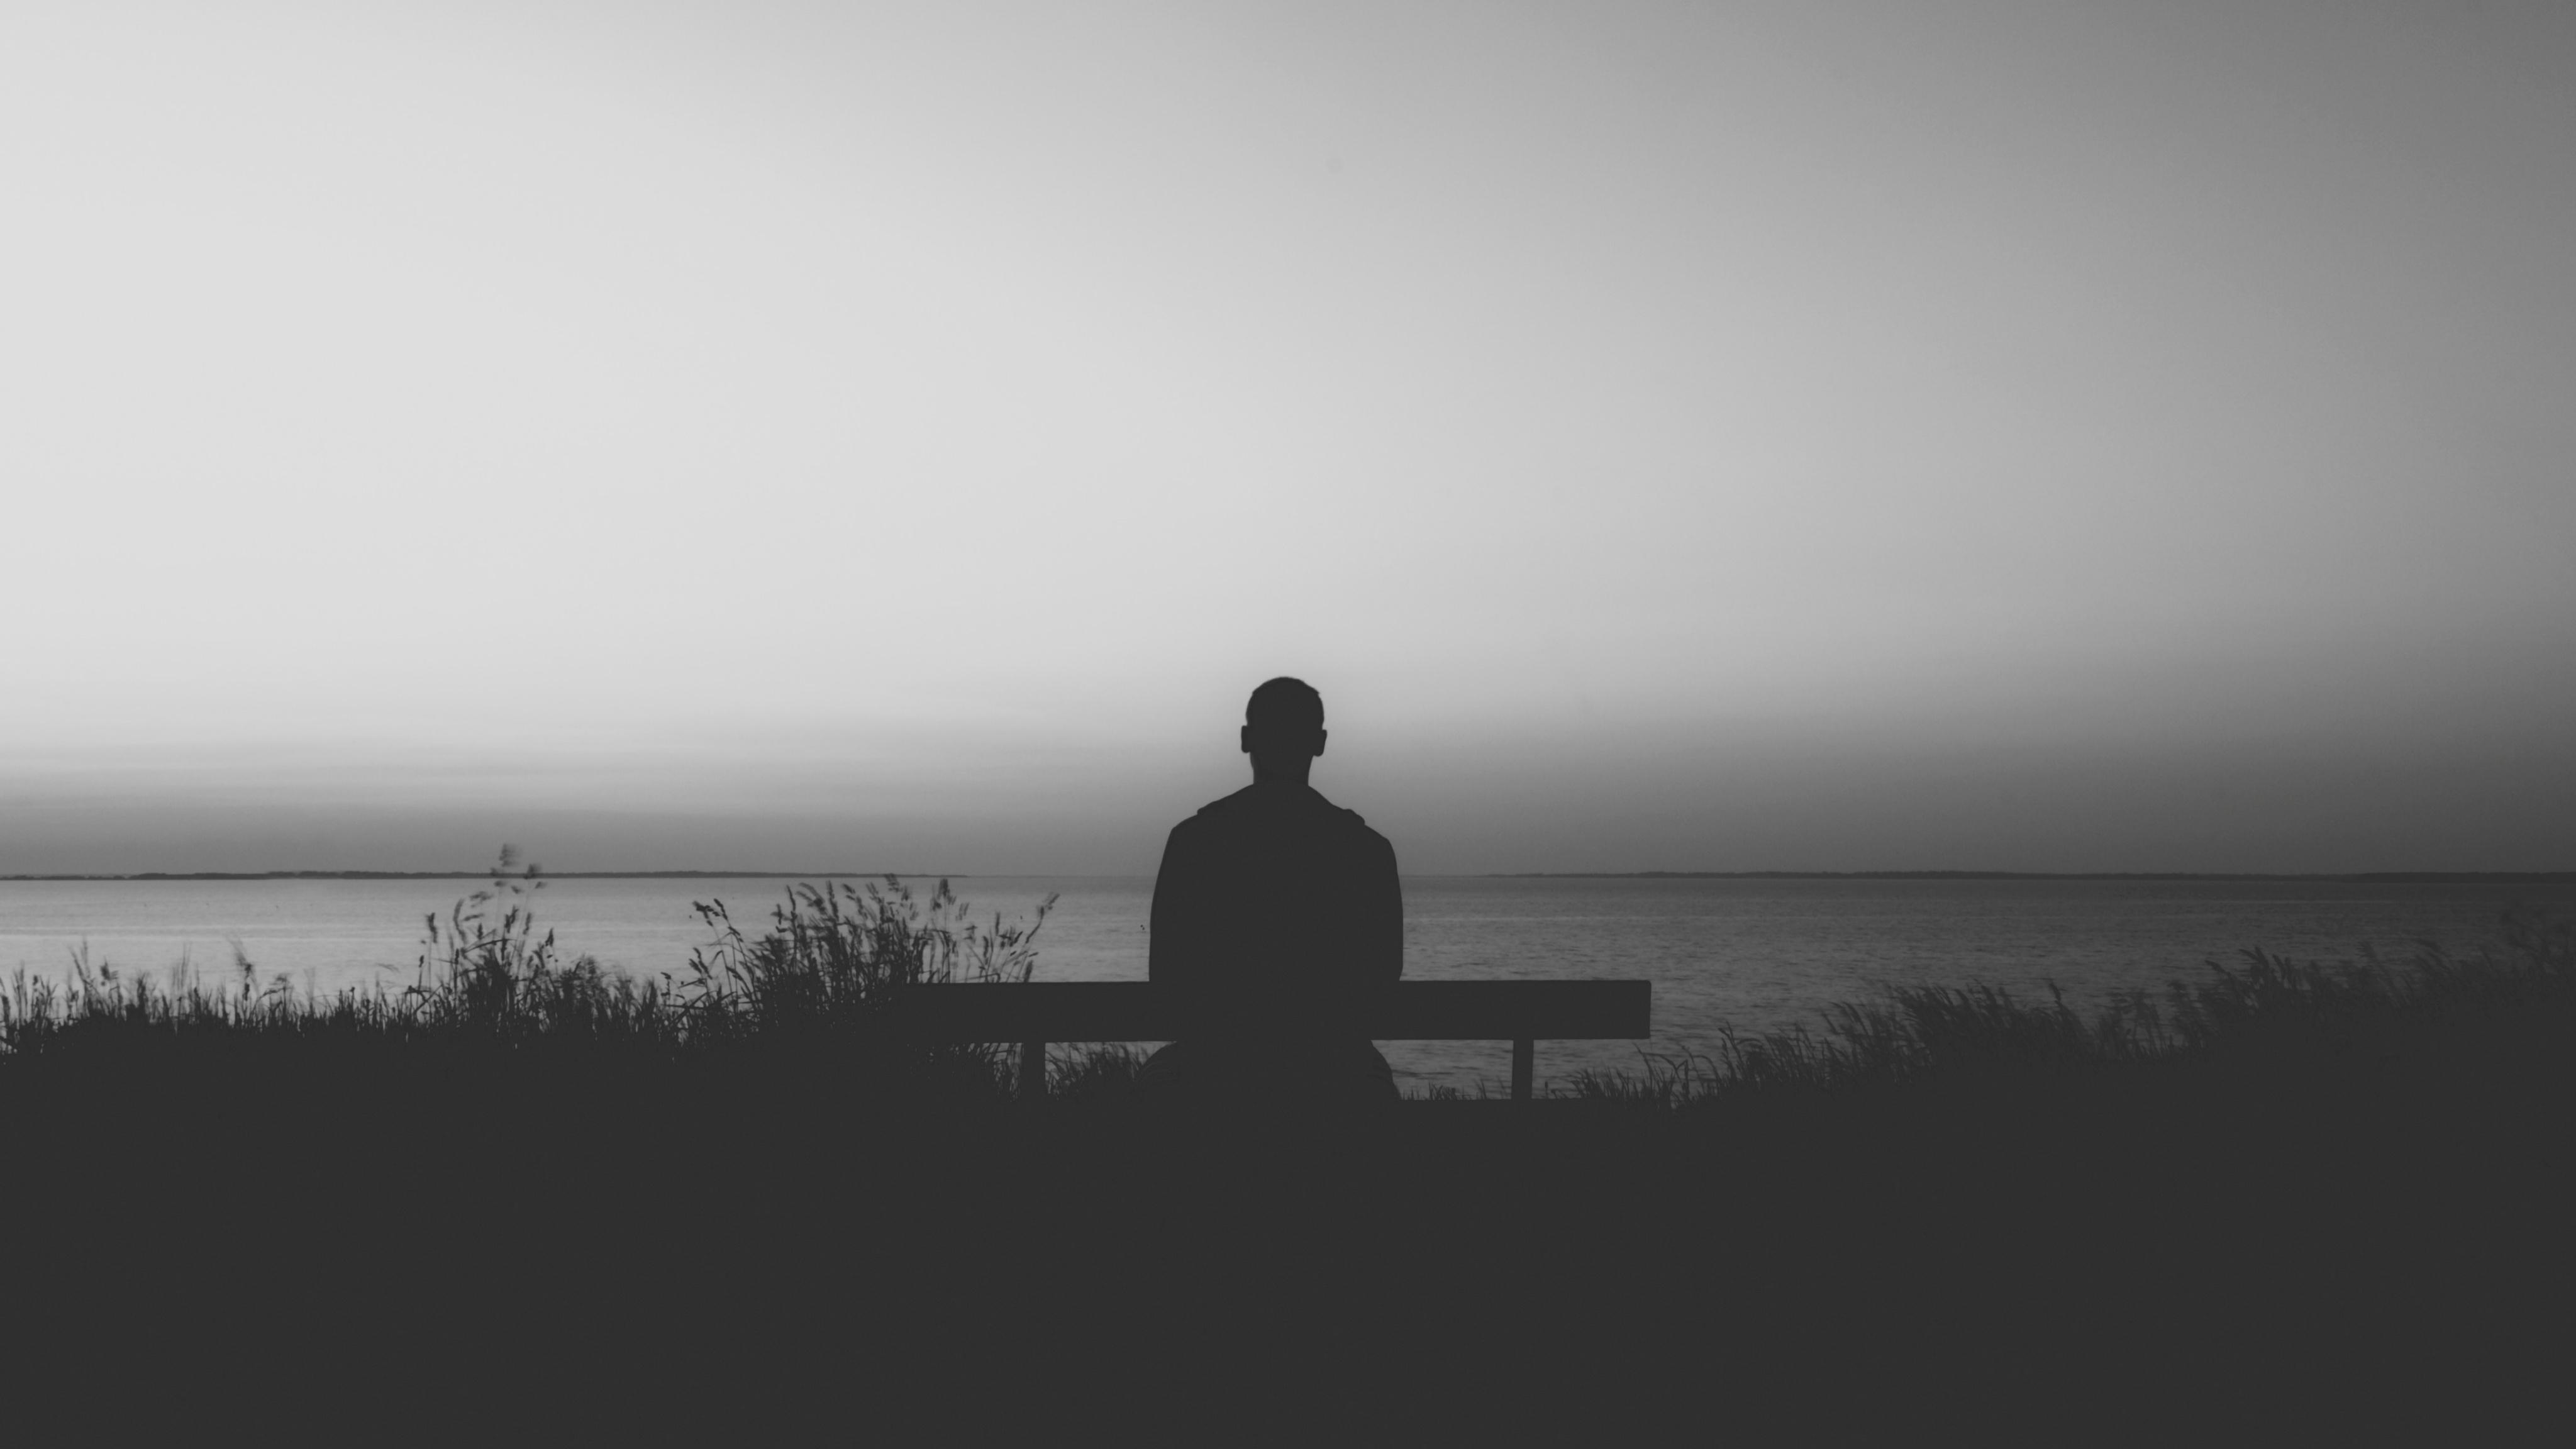 Waiting When God Seems Silent